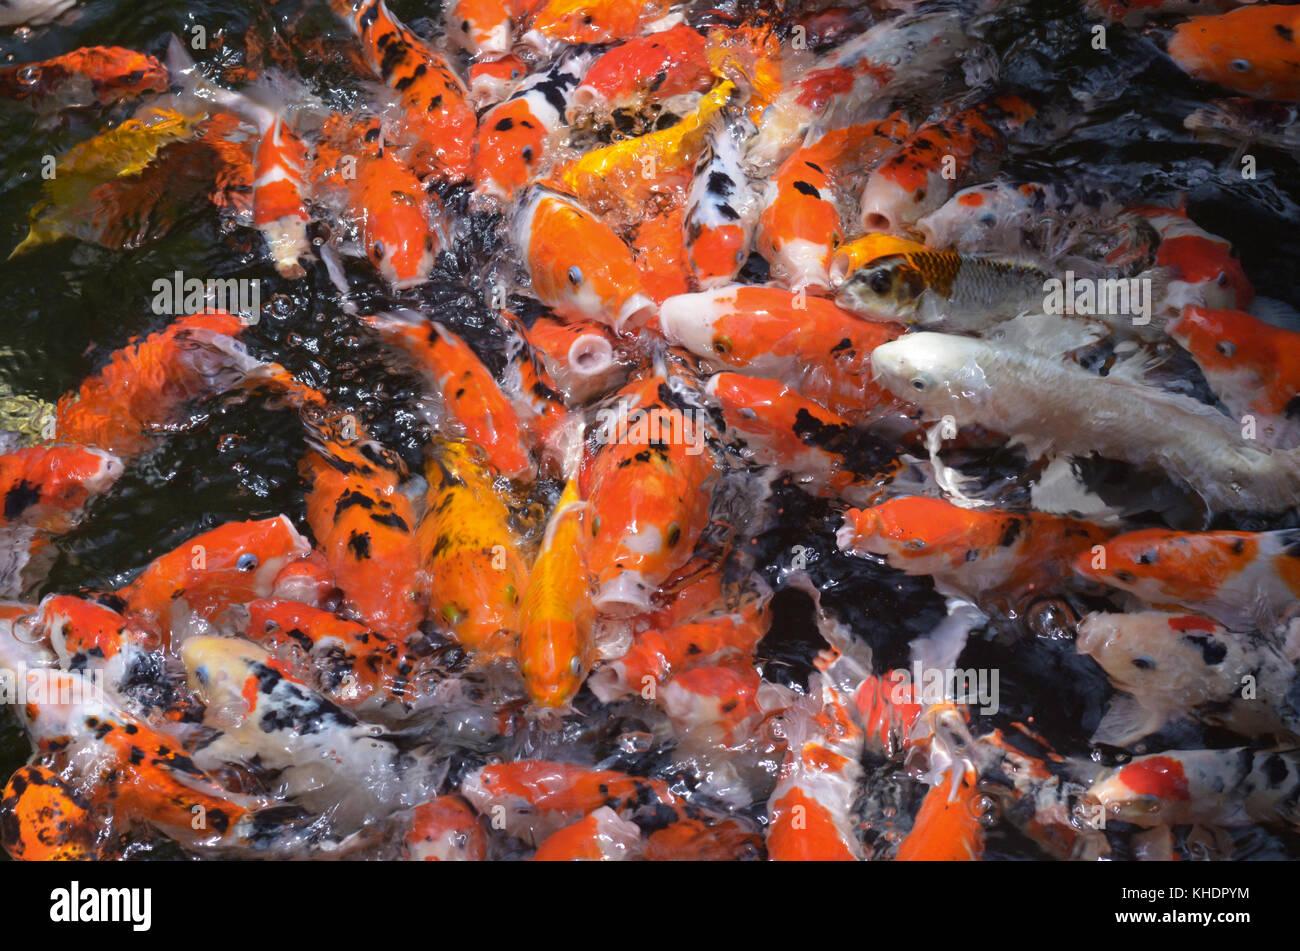 Amur carp stock photos amur carp stock images alamy for What to feed koi carp